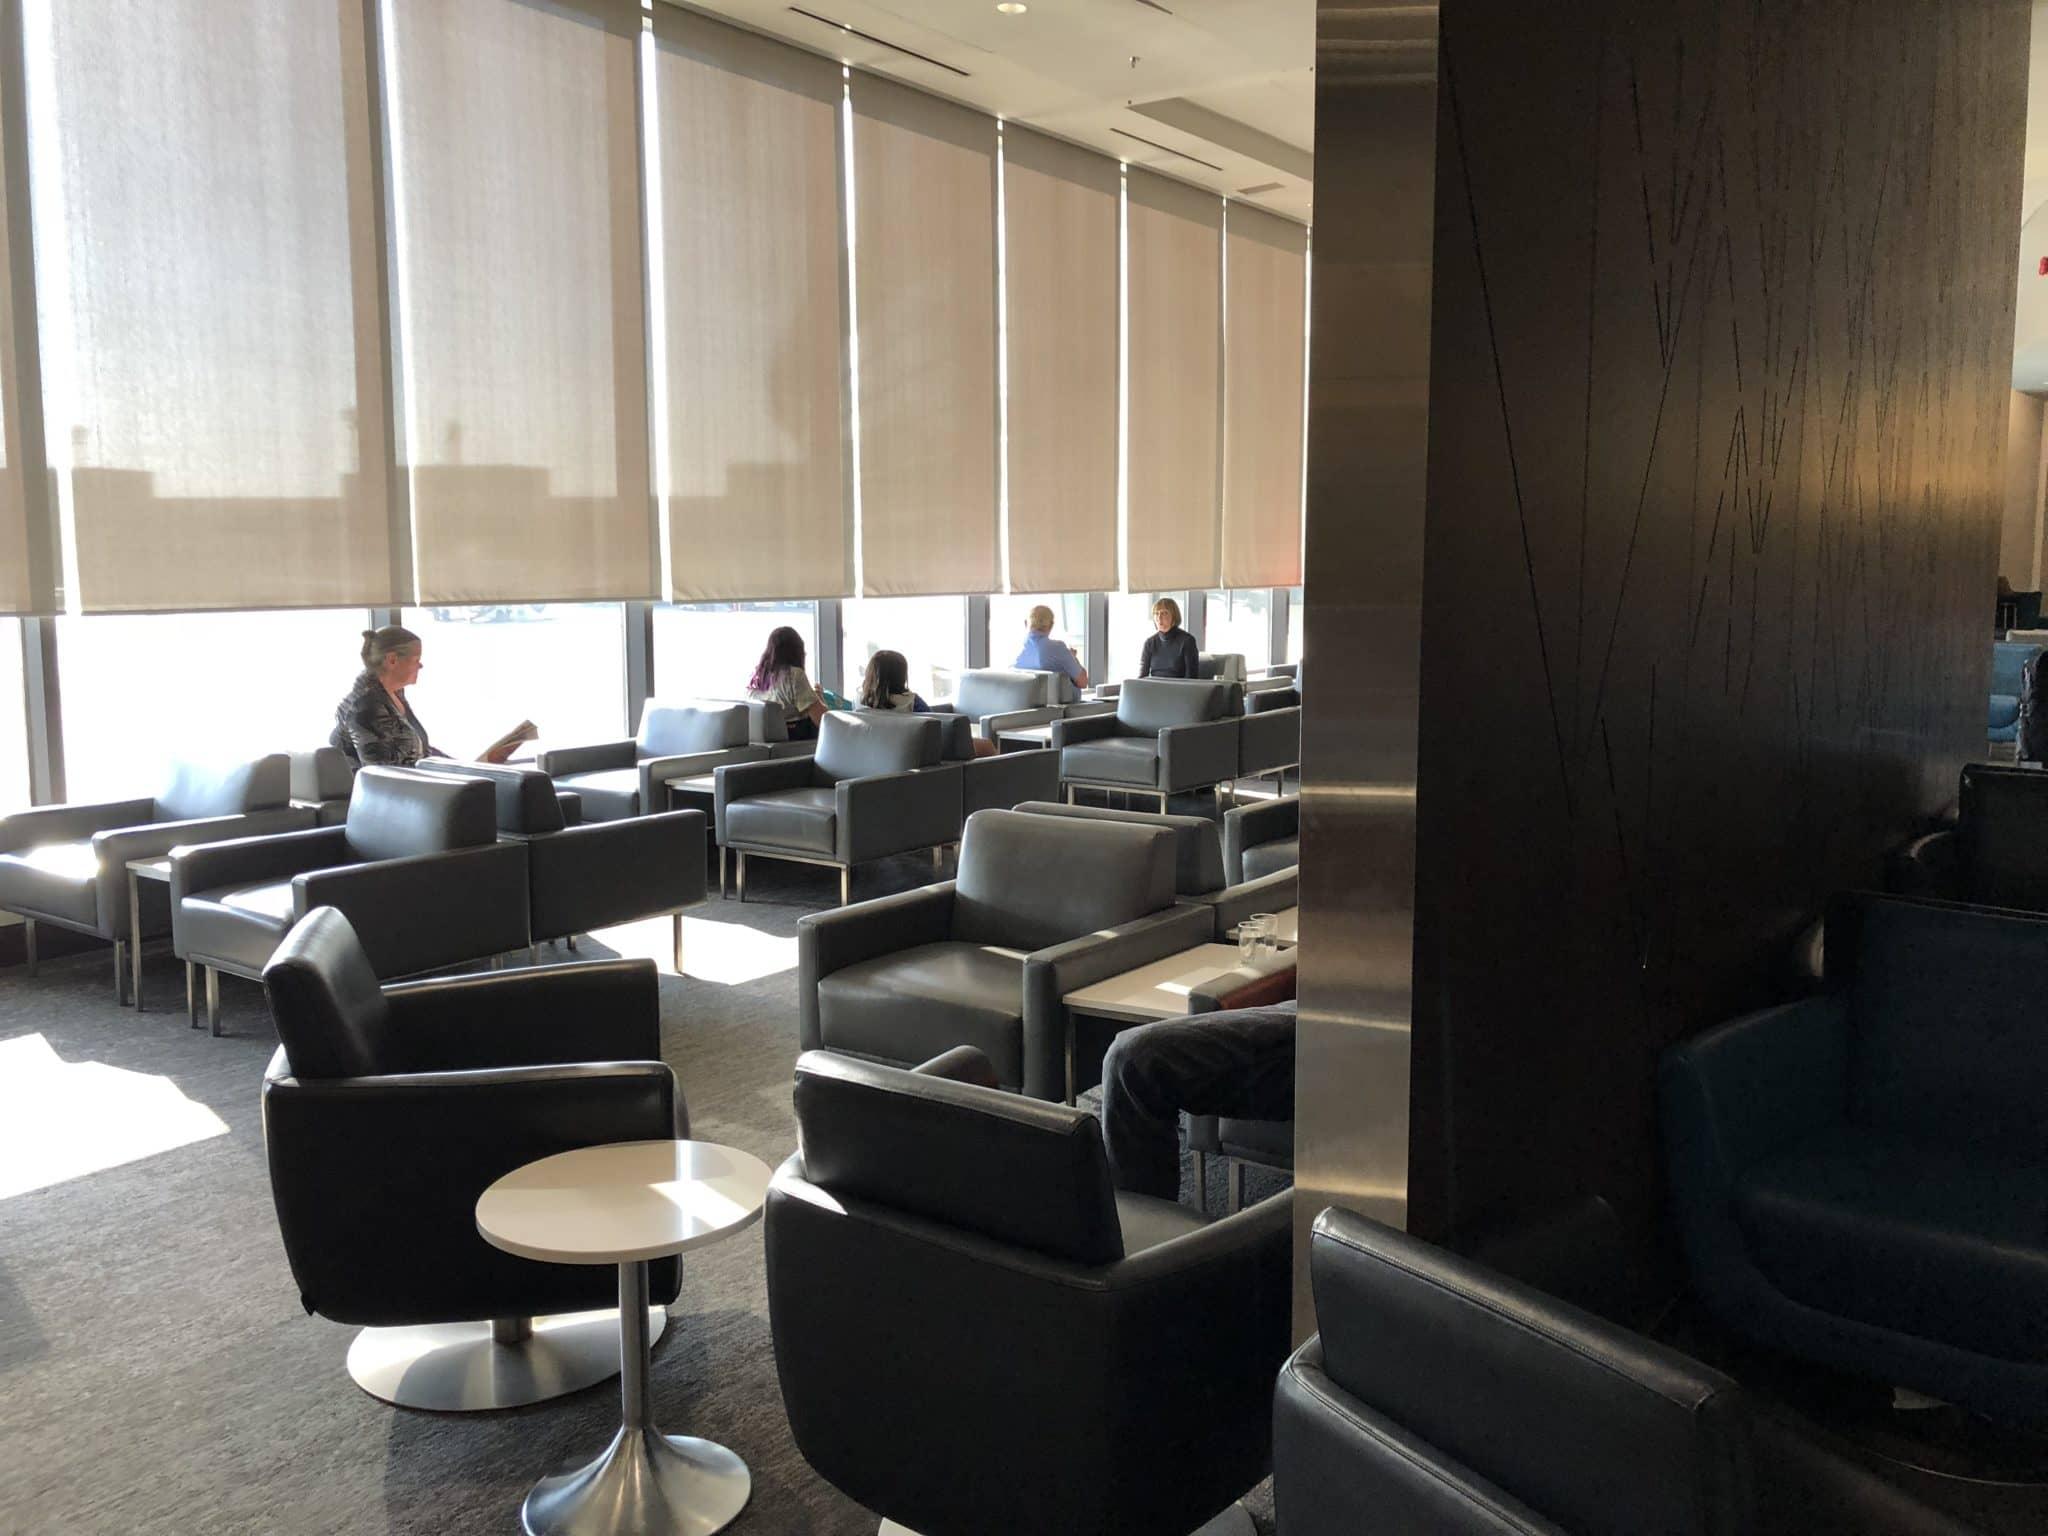 Air Canada Maple Leaf Lounge Calgary Blick auf Fensterfront